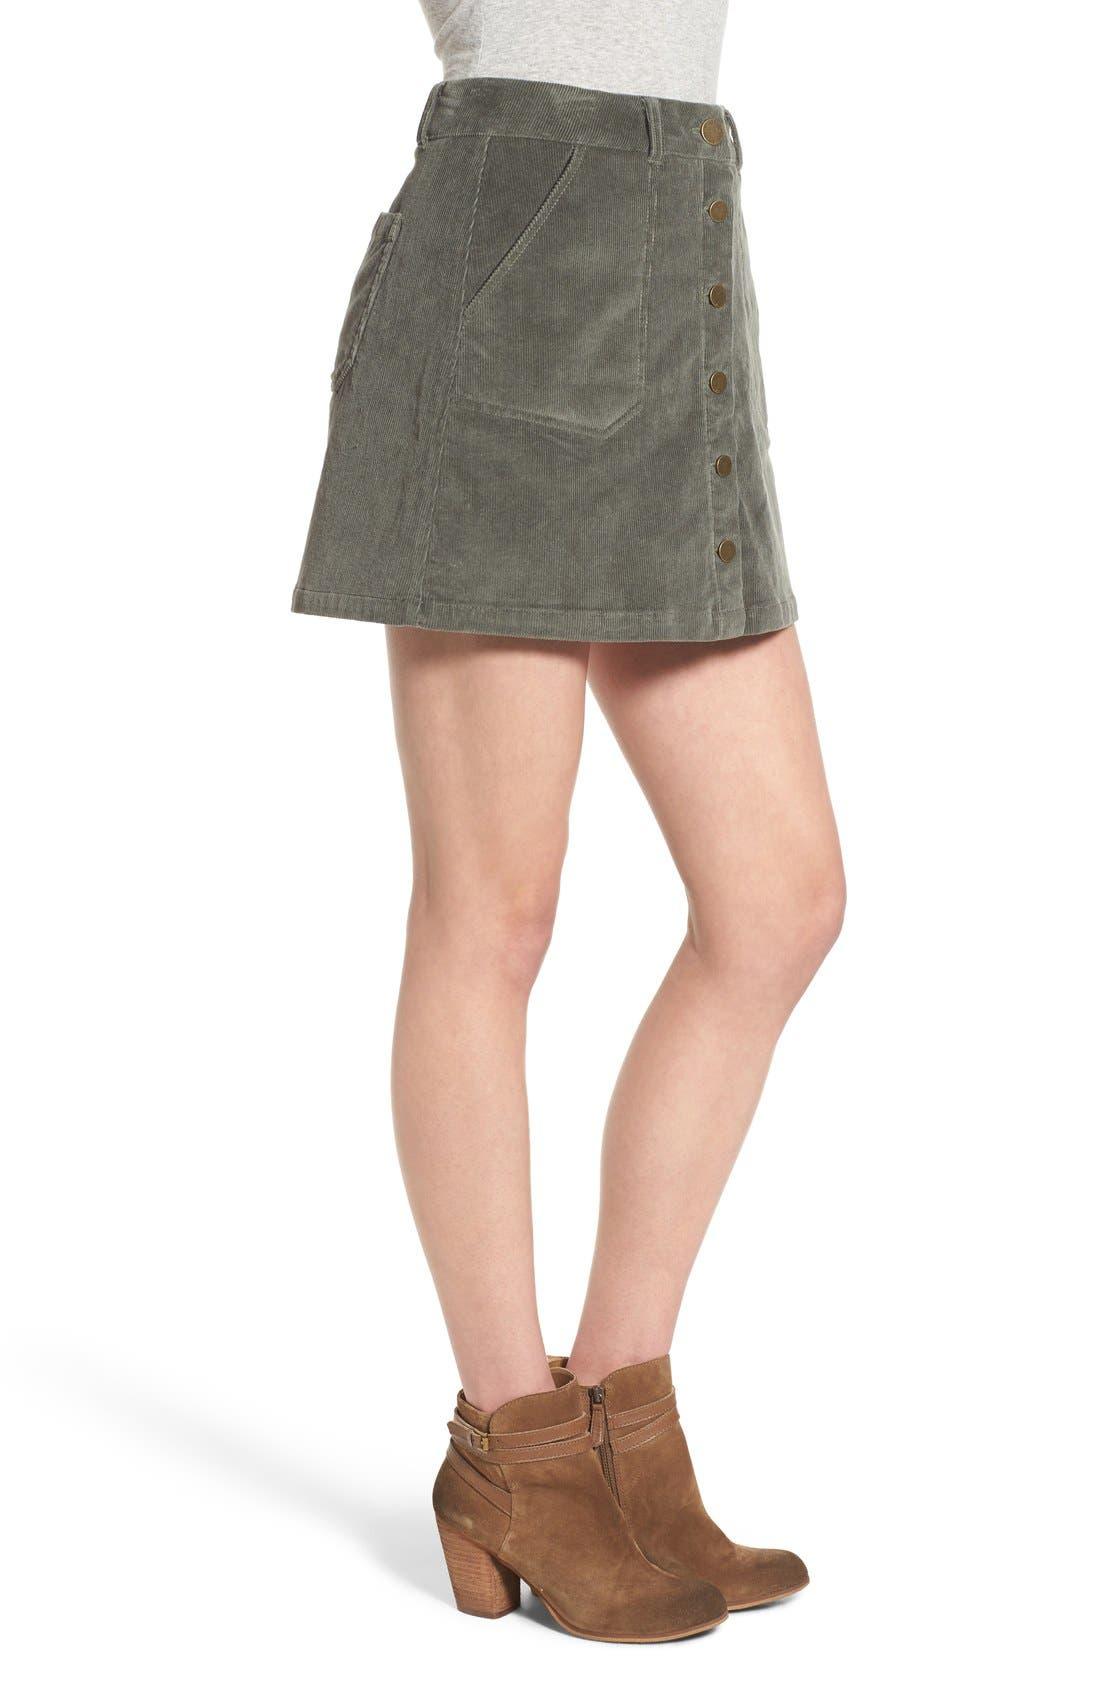 JOLT, Corduroy A-Line Skirt, Alternate thumbnail 2, color, 300